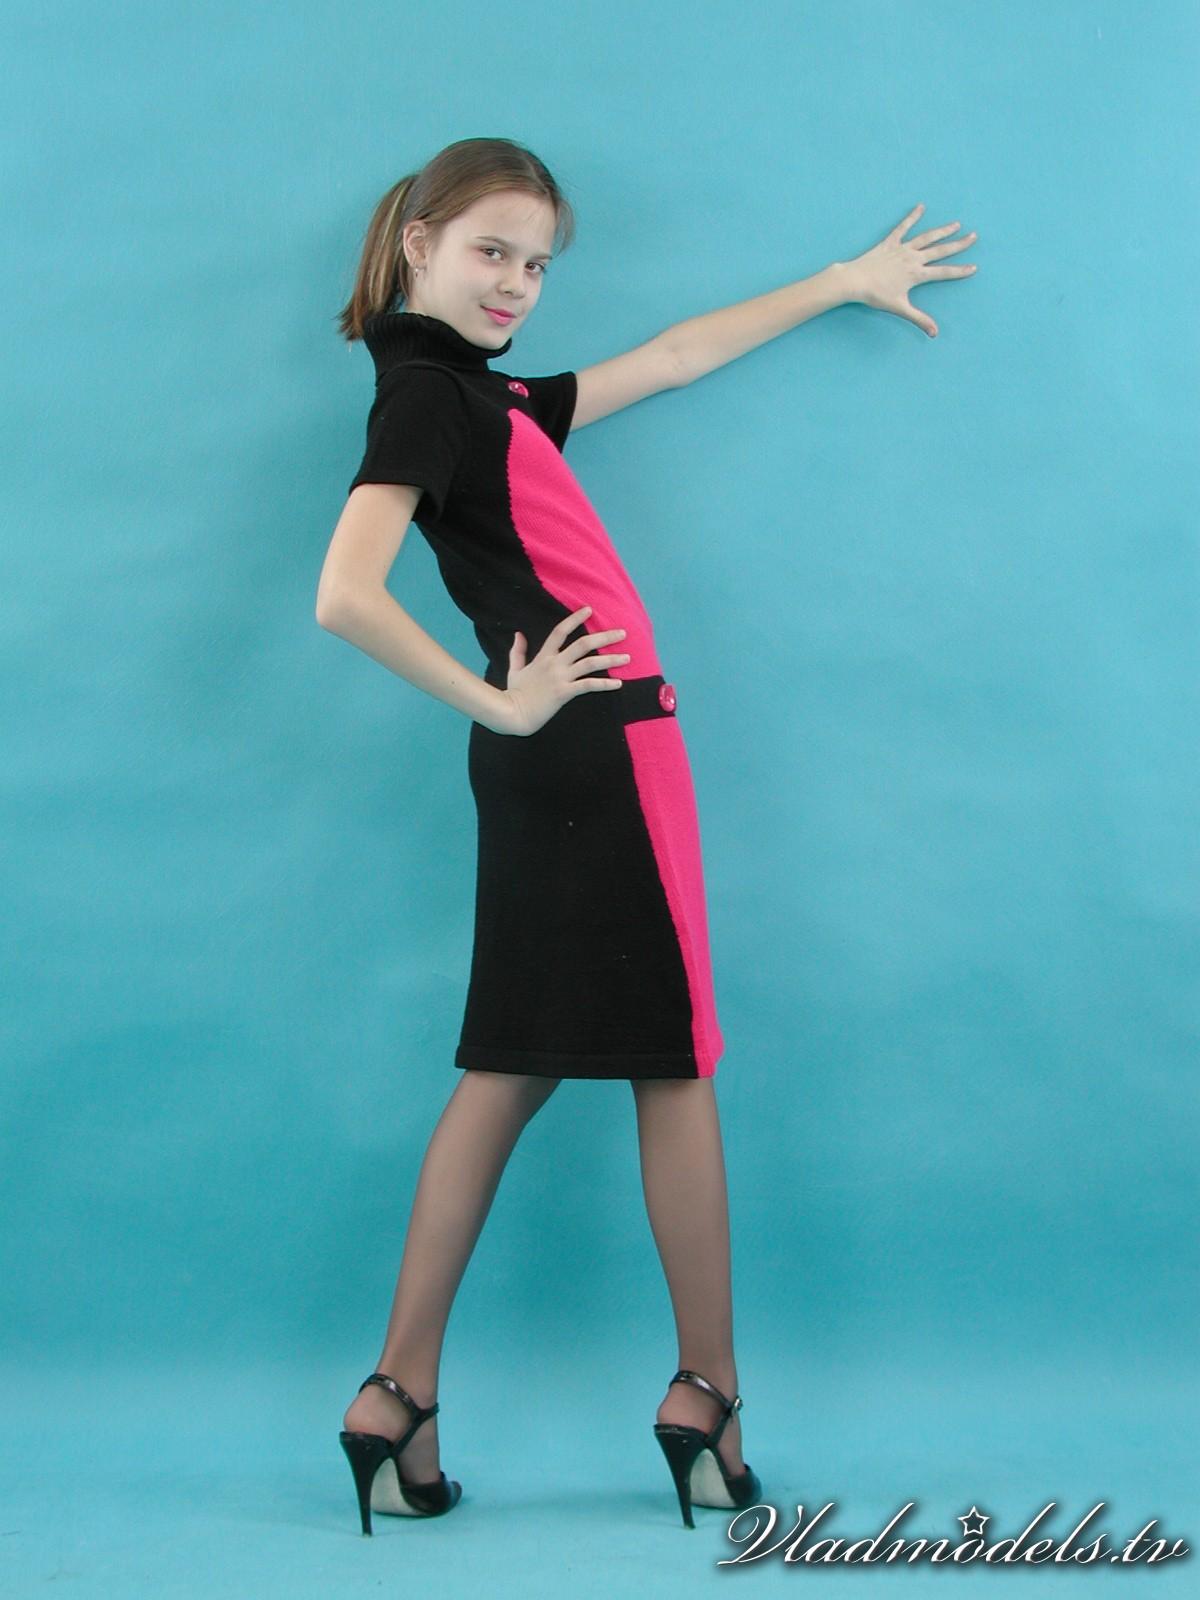 2013 01 vladmodel pantyhose w007 set 030 natasha html vladmodels tv